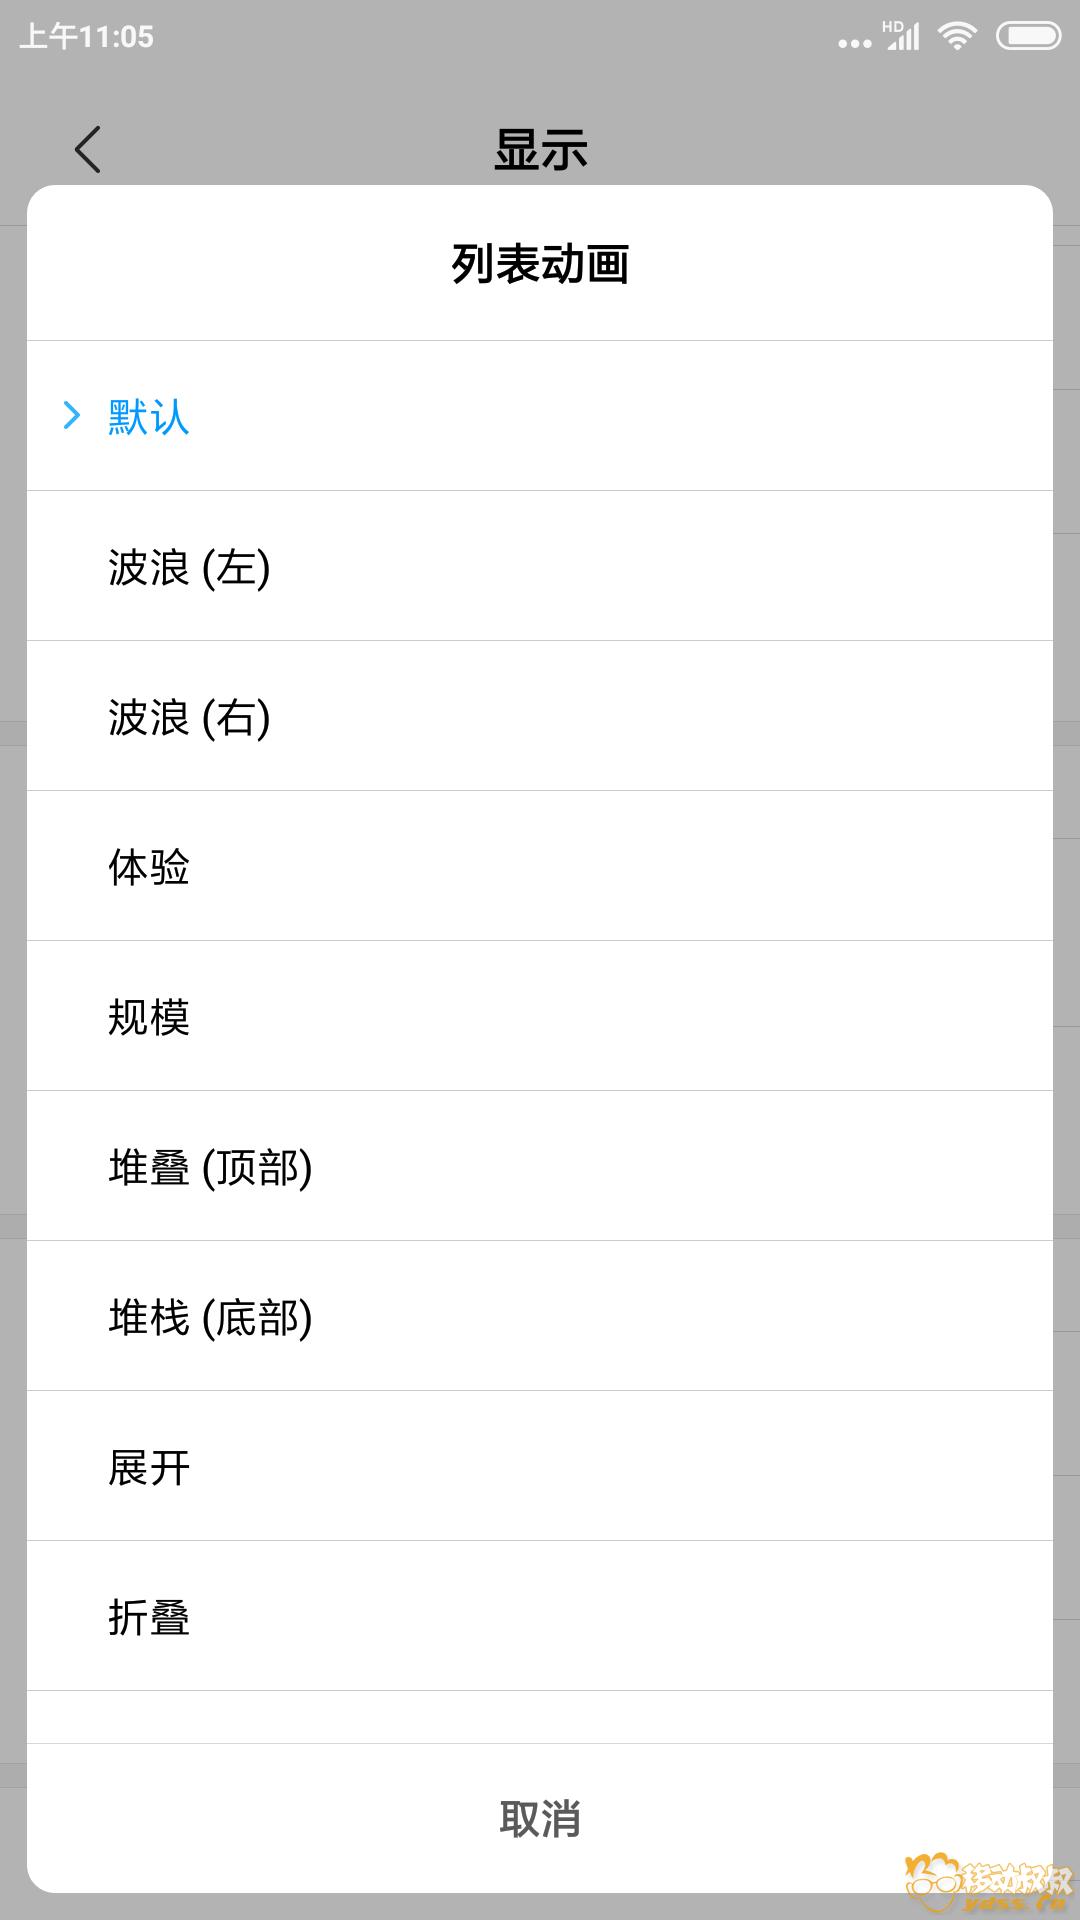 Screenshot_2018-07-02-11-05-07-393_com.android.settings.png